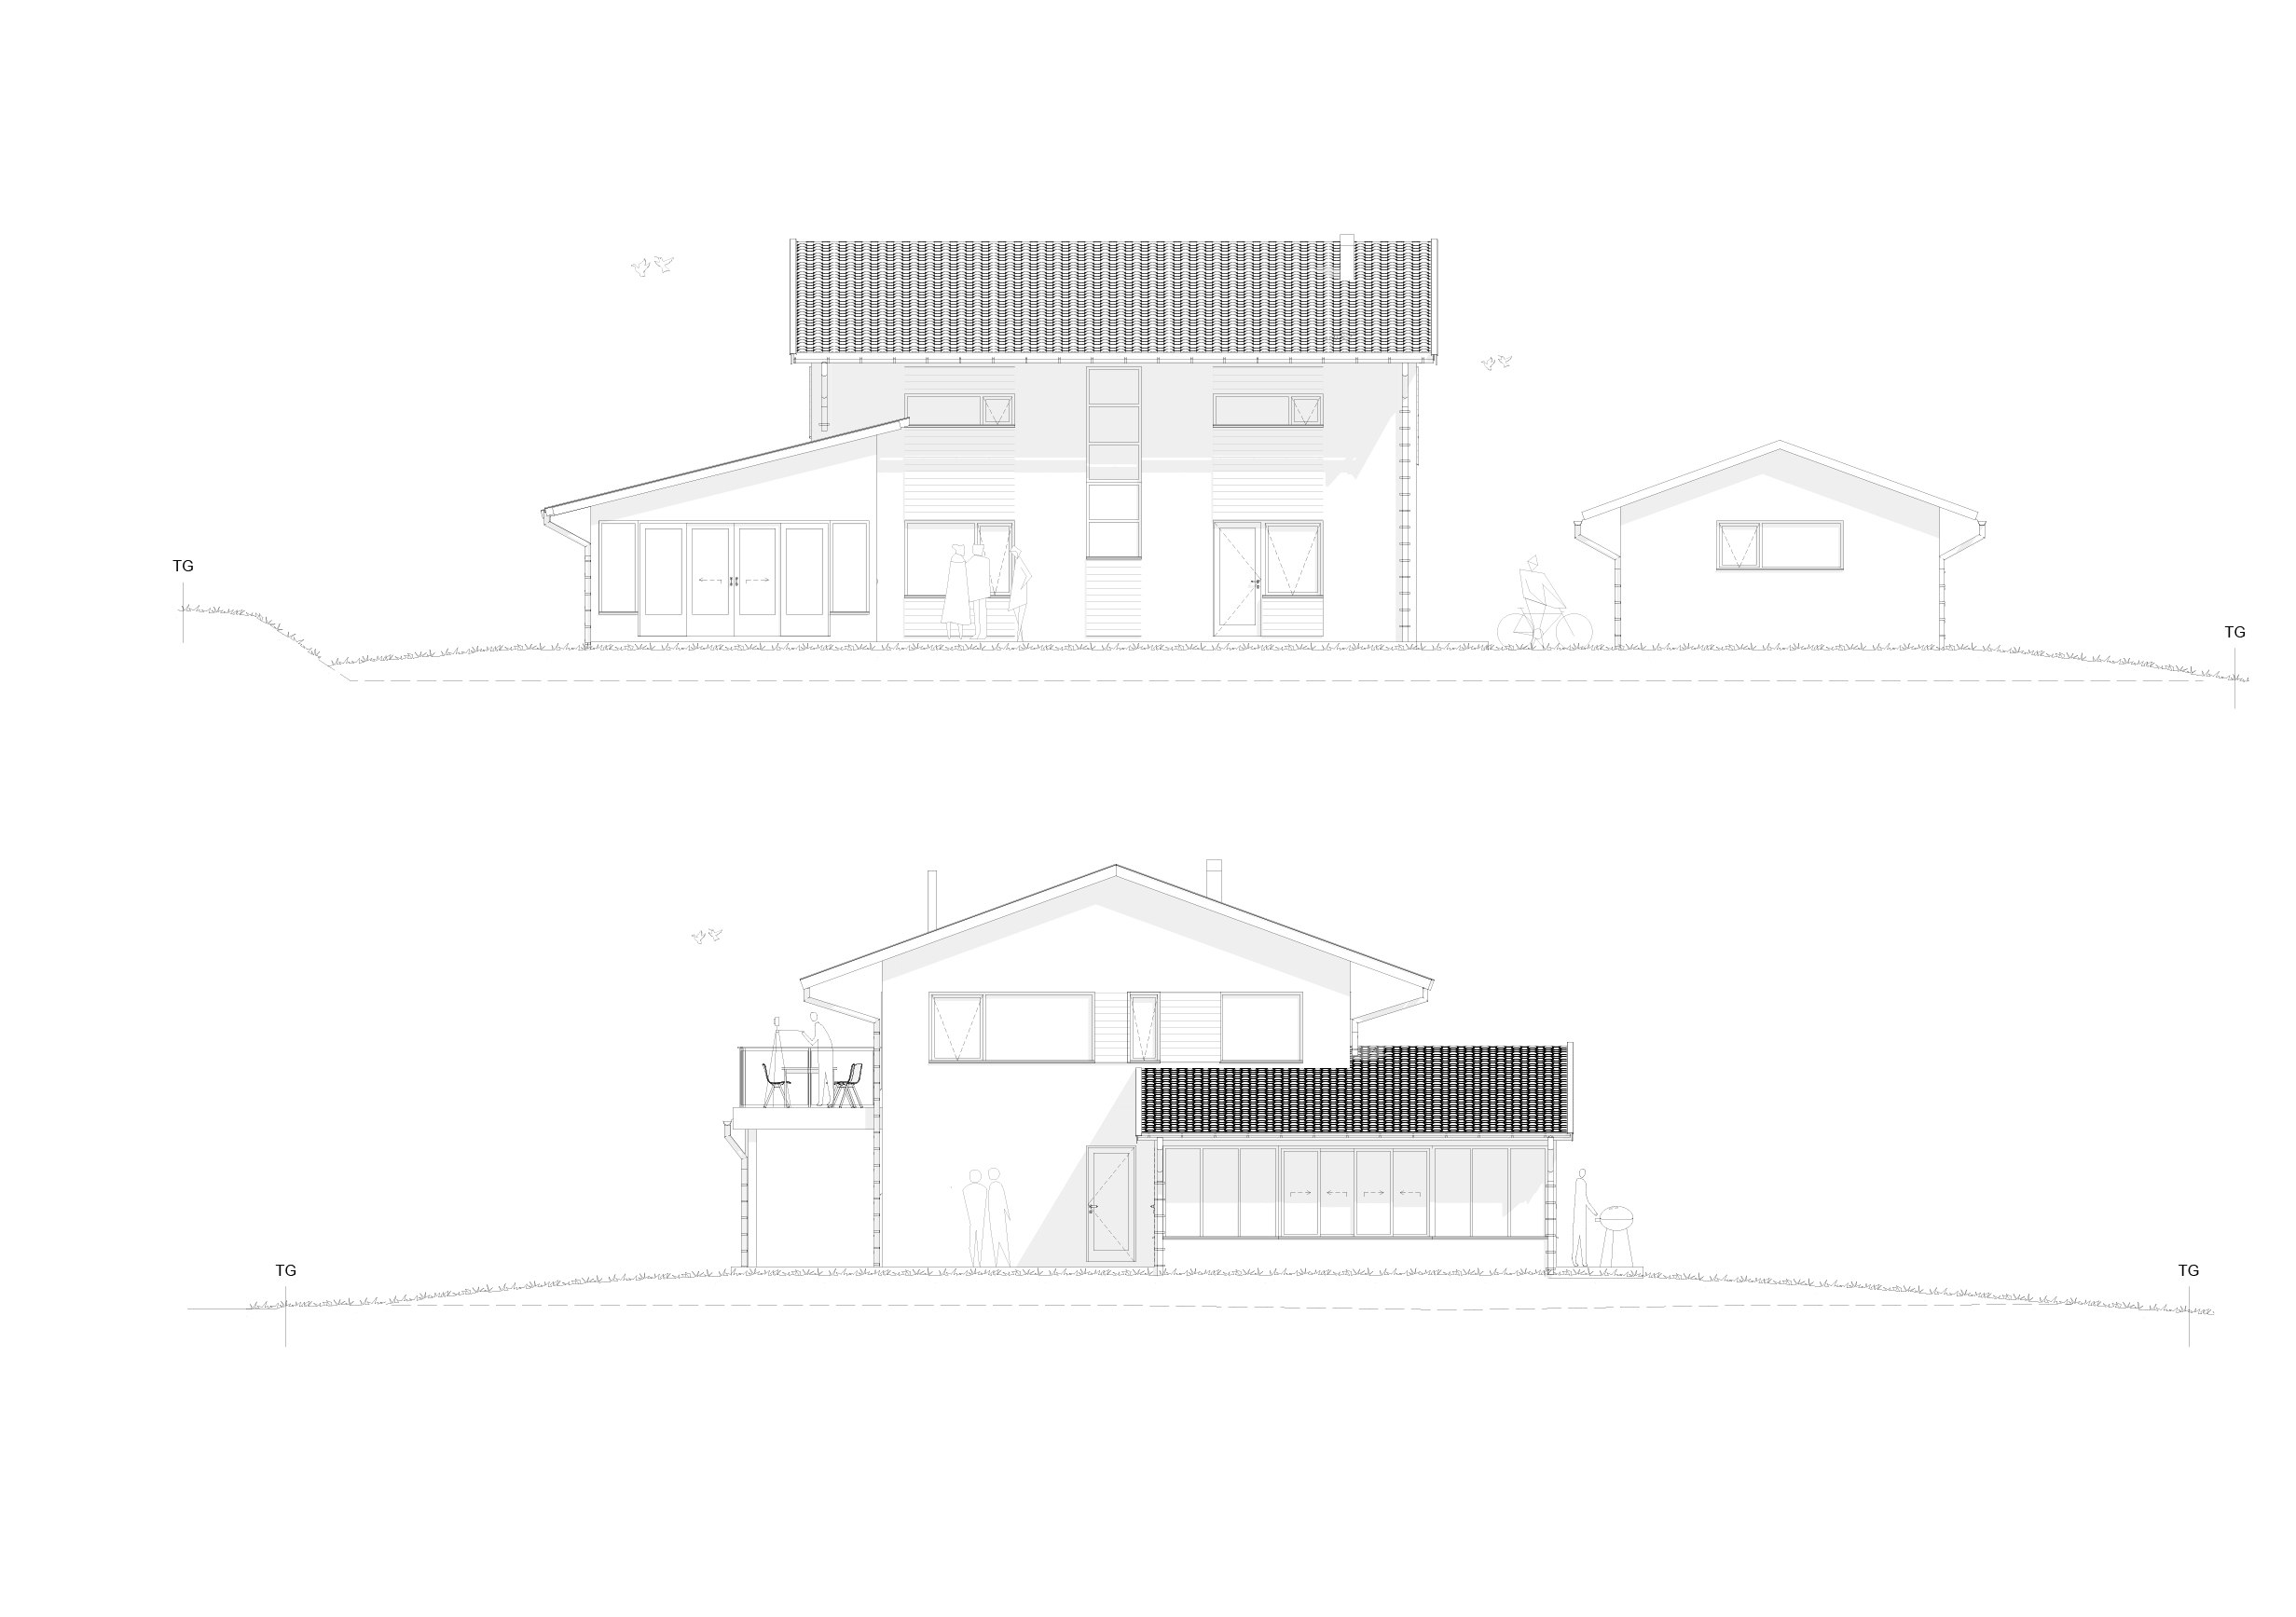 Fasad Villa lättbetong Karlskrona puts arkitekt